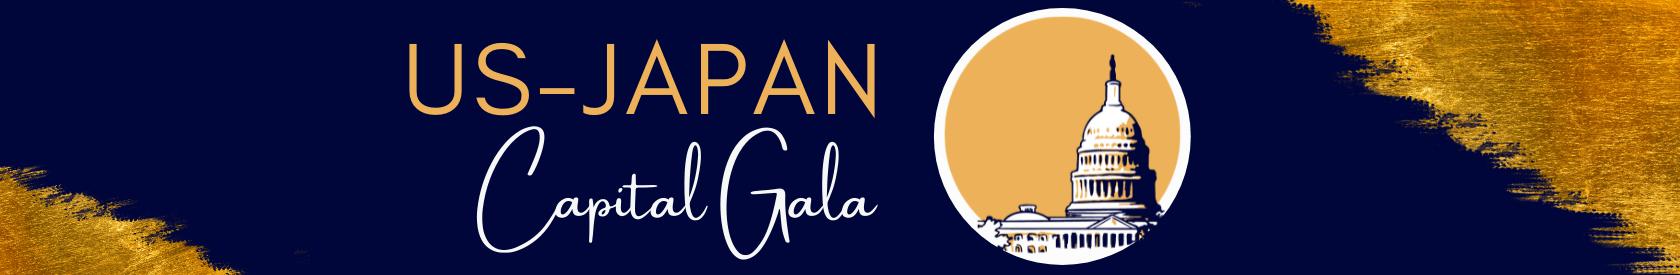 The 35th Annual US-Japan Capital Gala